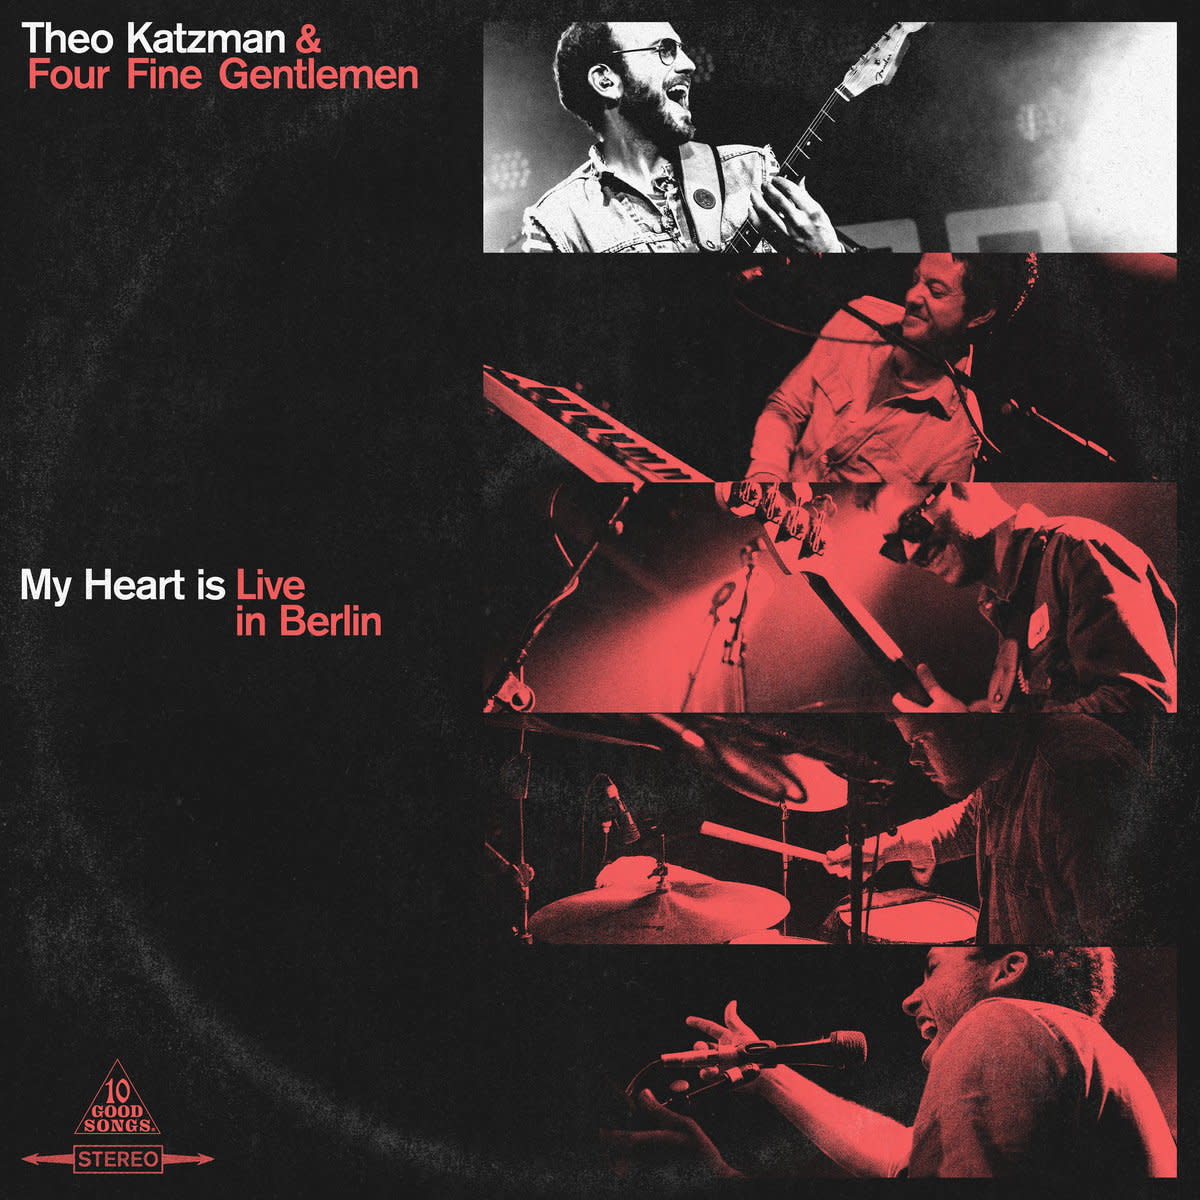 Theo Katzman